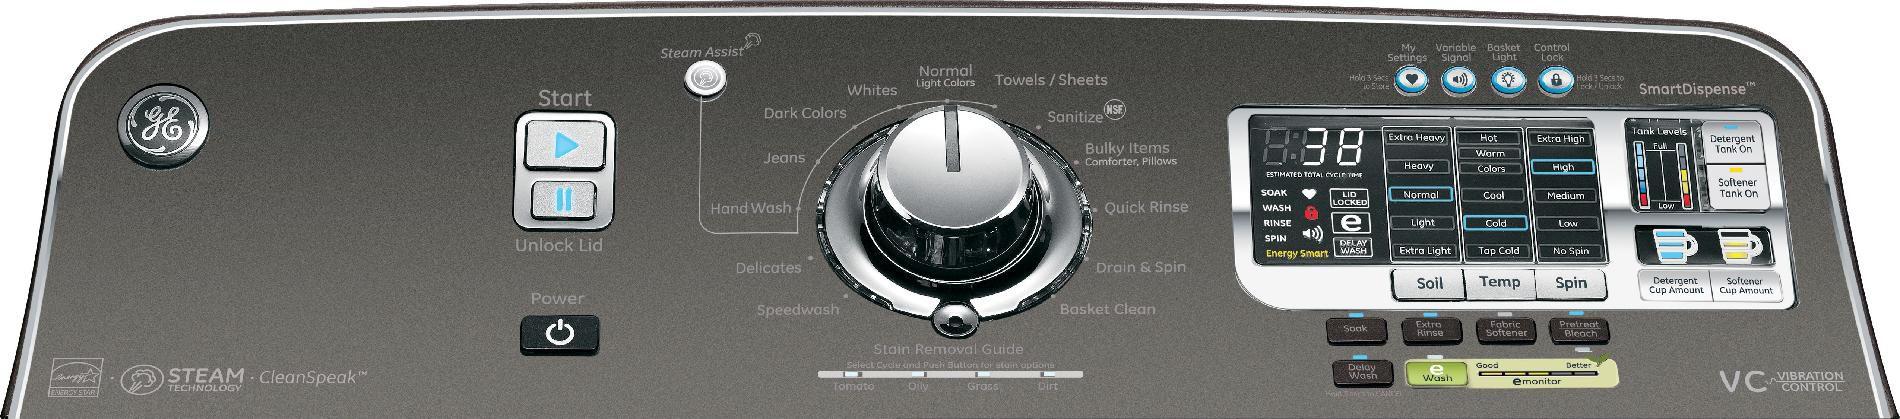 GE 5.0 cu. ft. Top-Load Washer - Metallic Carbon